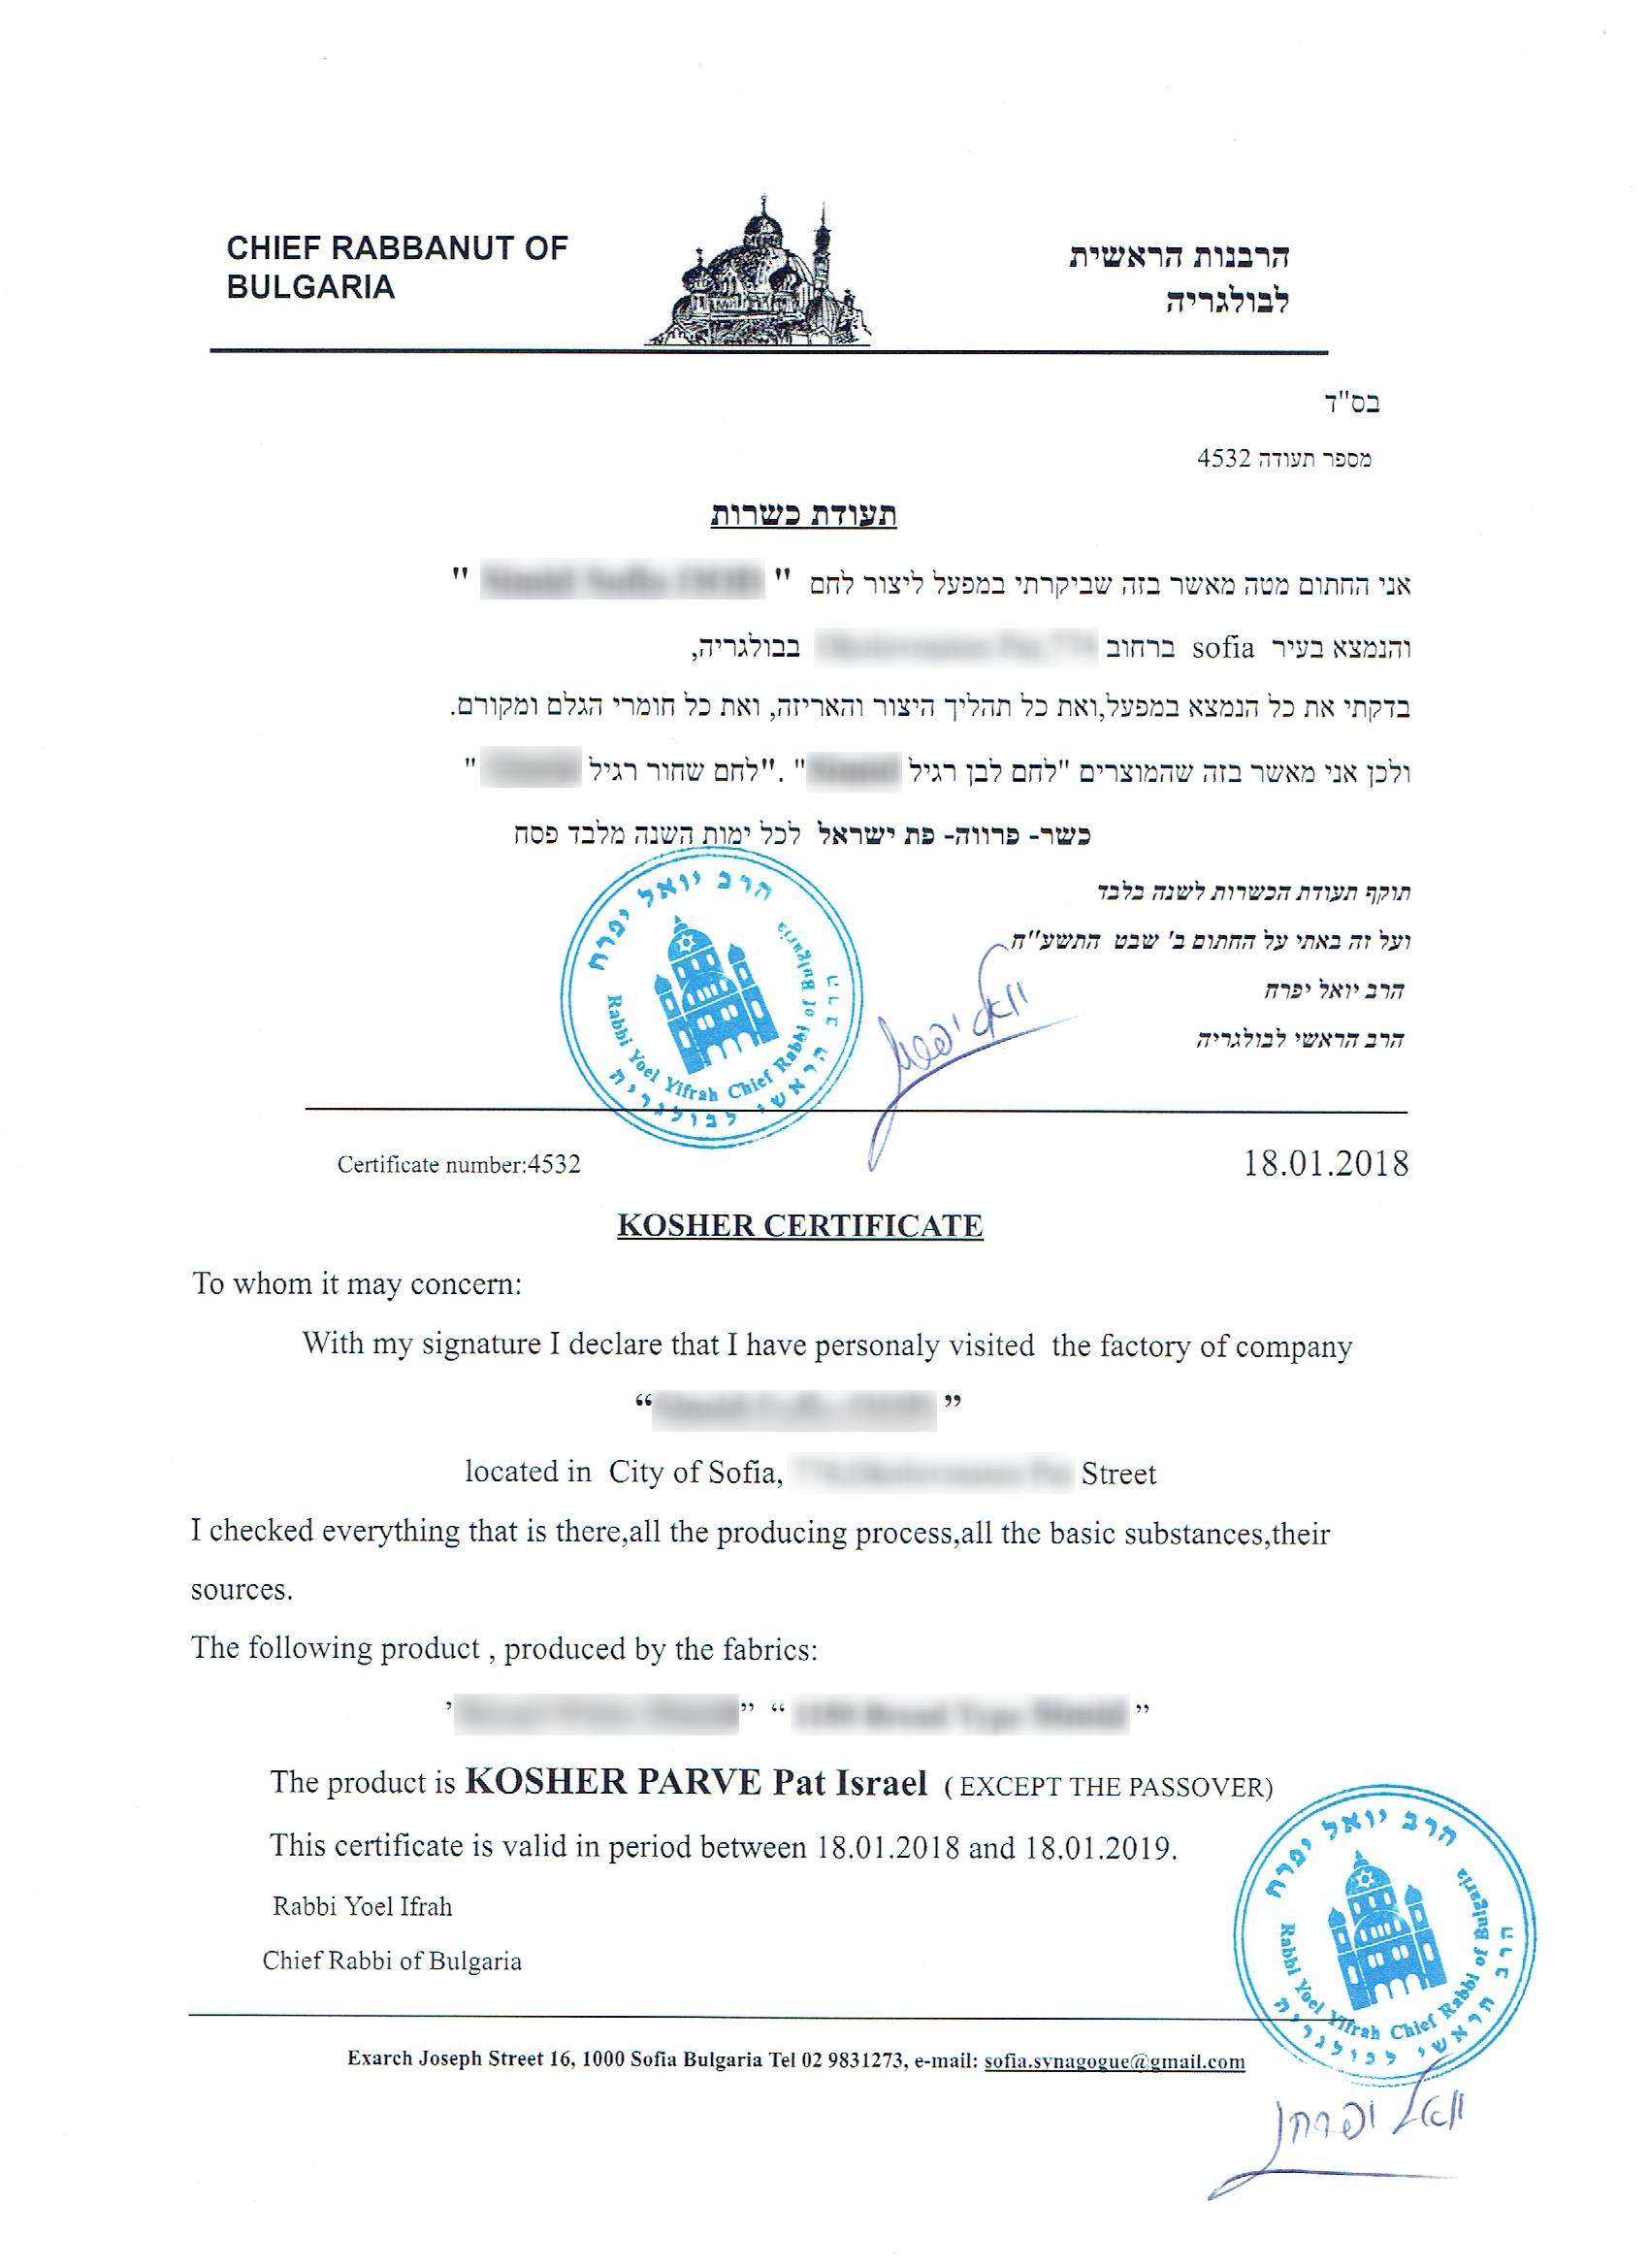 Kosher_Certificate2